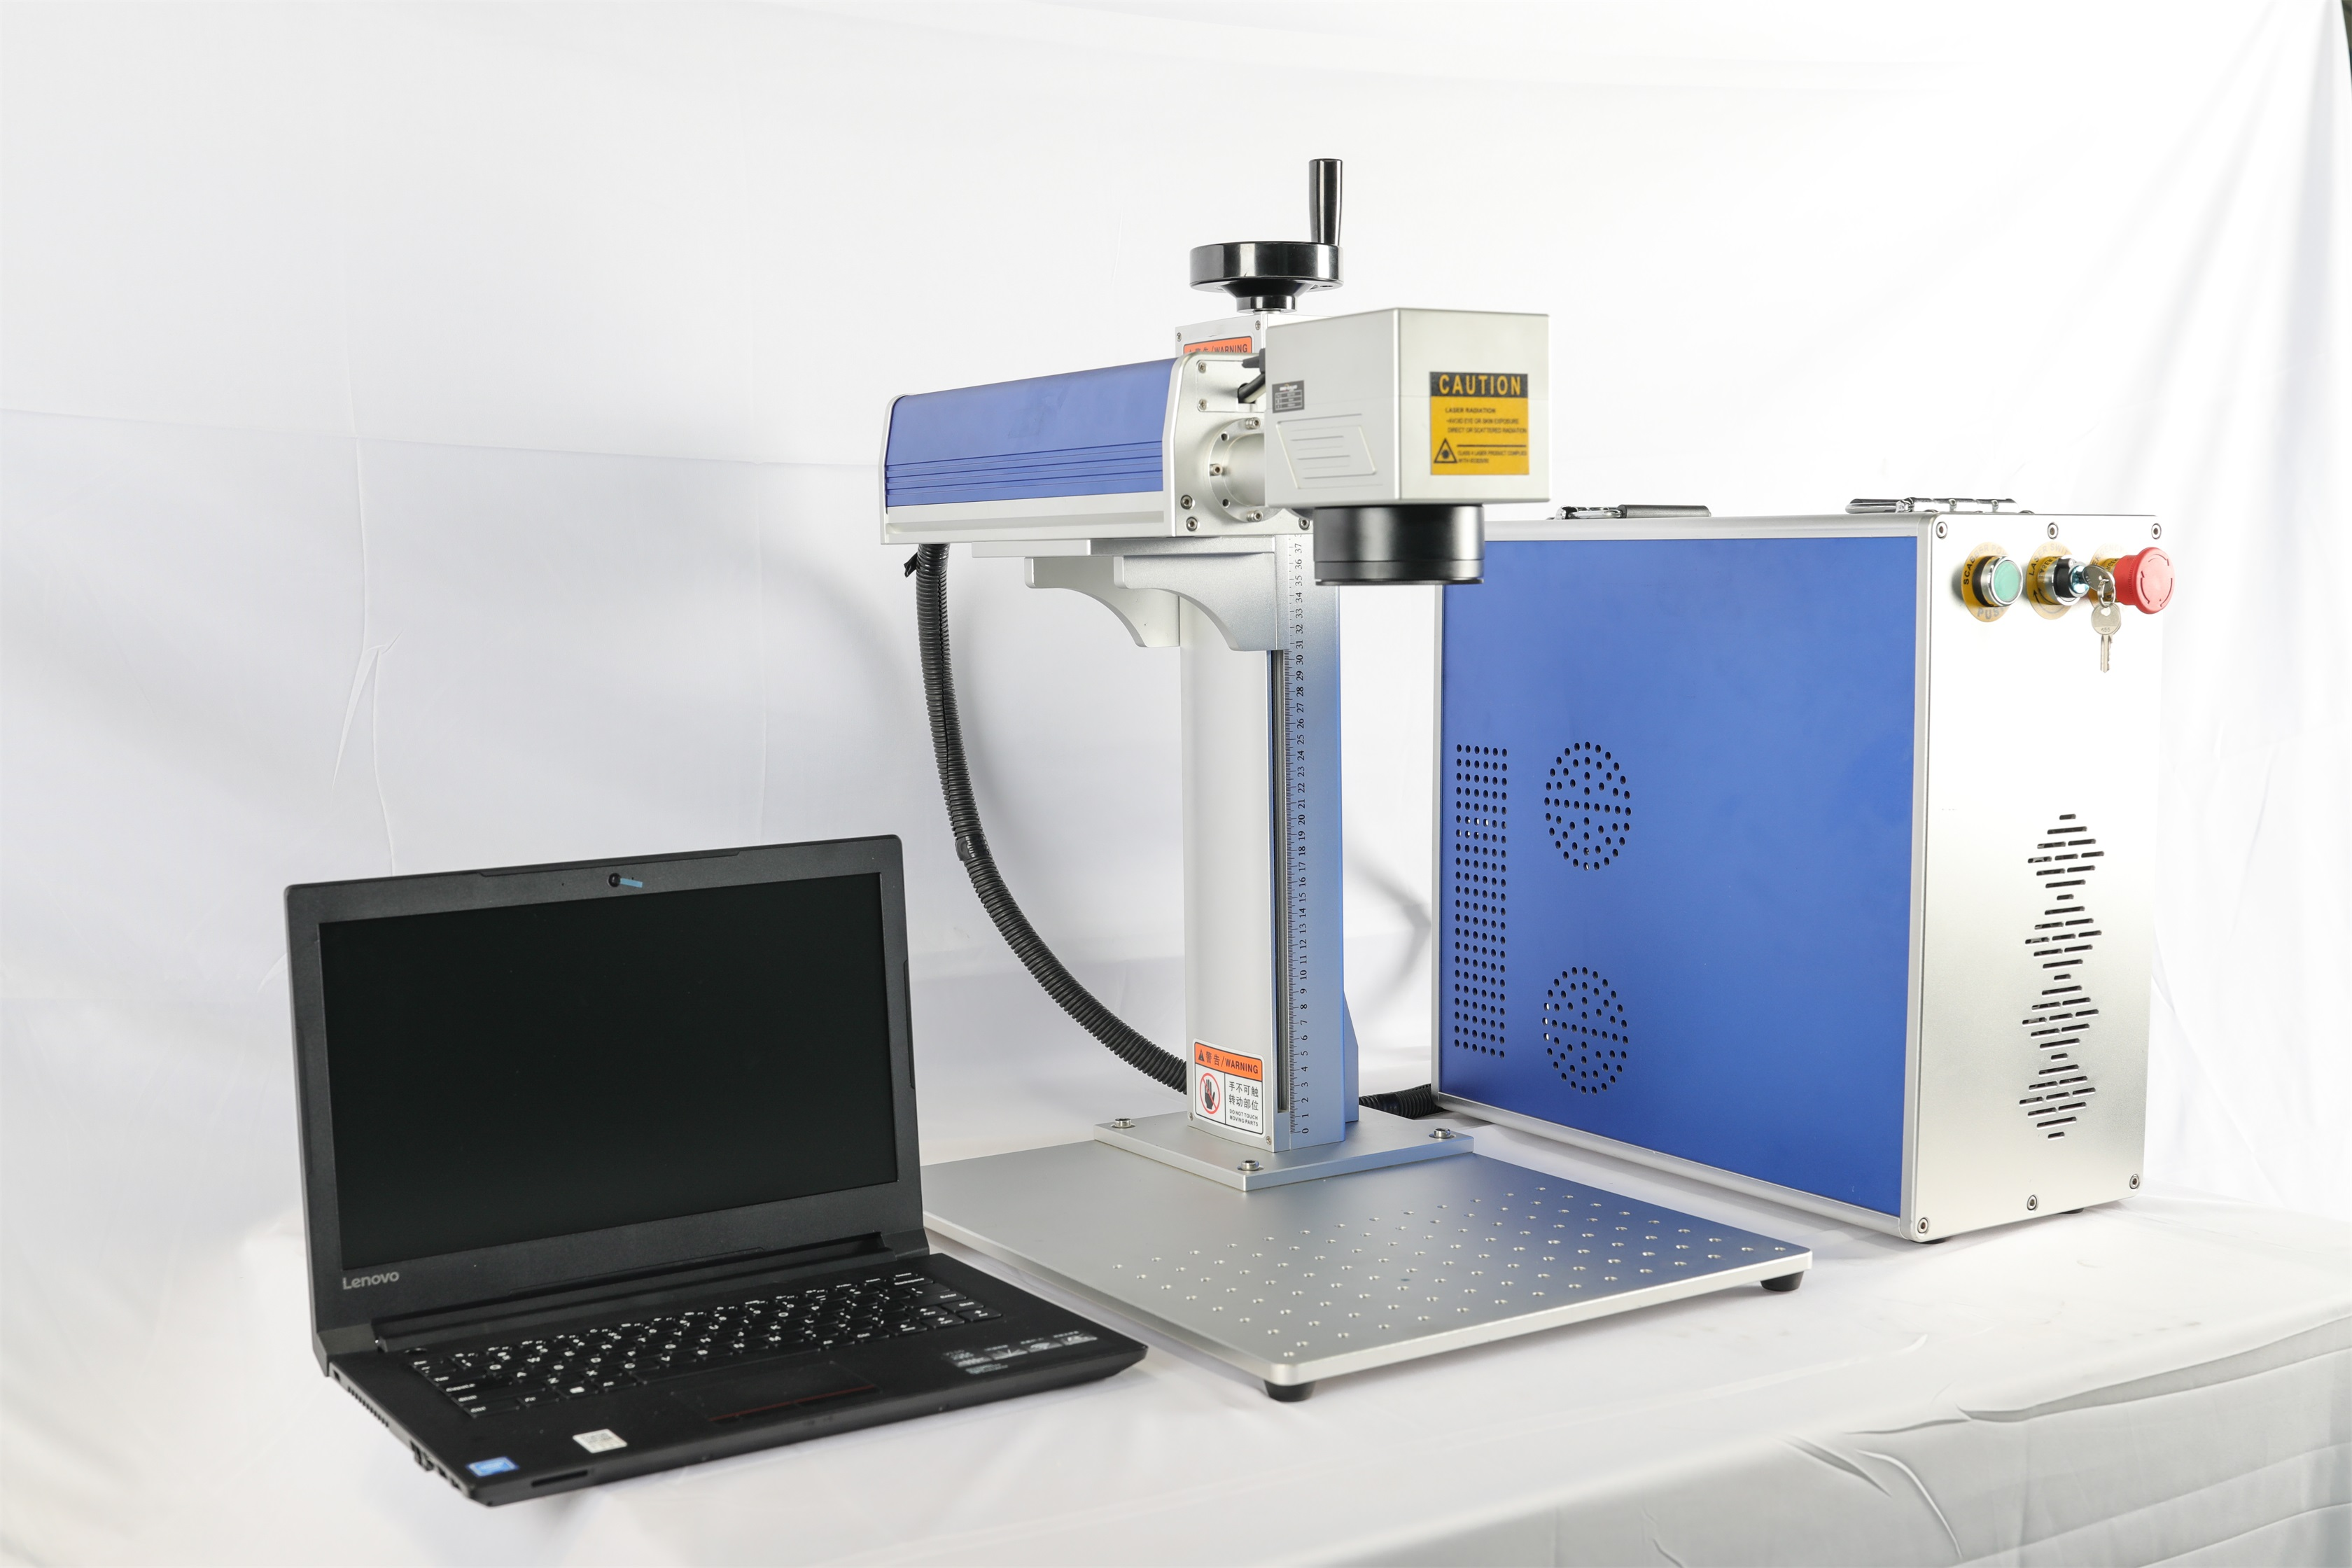 Greer Ring Silver And Gold Marking Fiber Raycus 20 W Laser Marking Machine Fiber Laser Marker